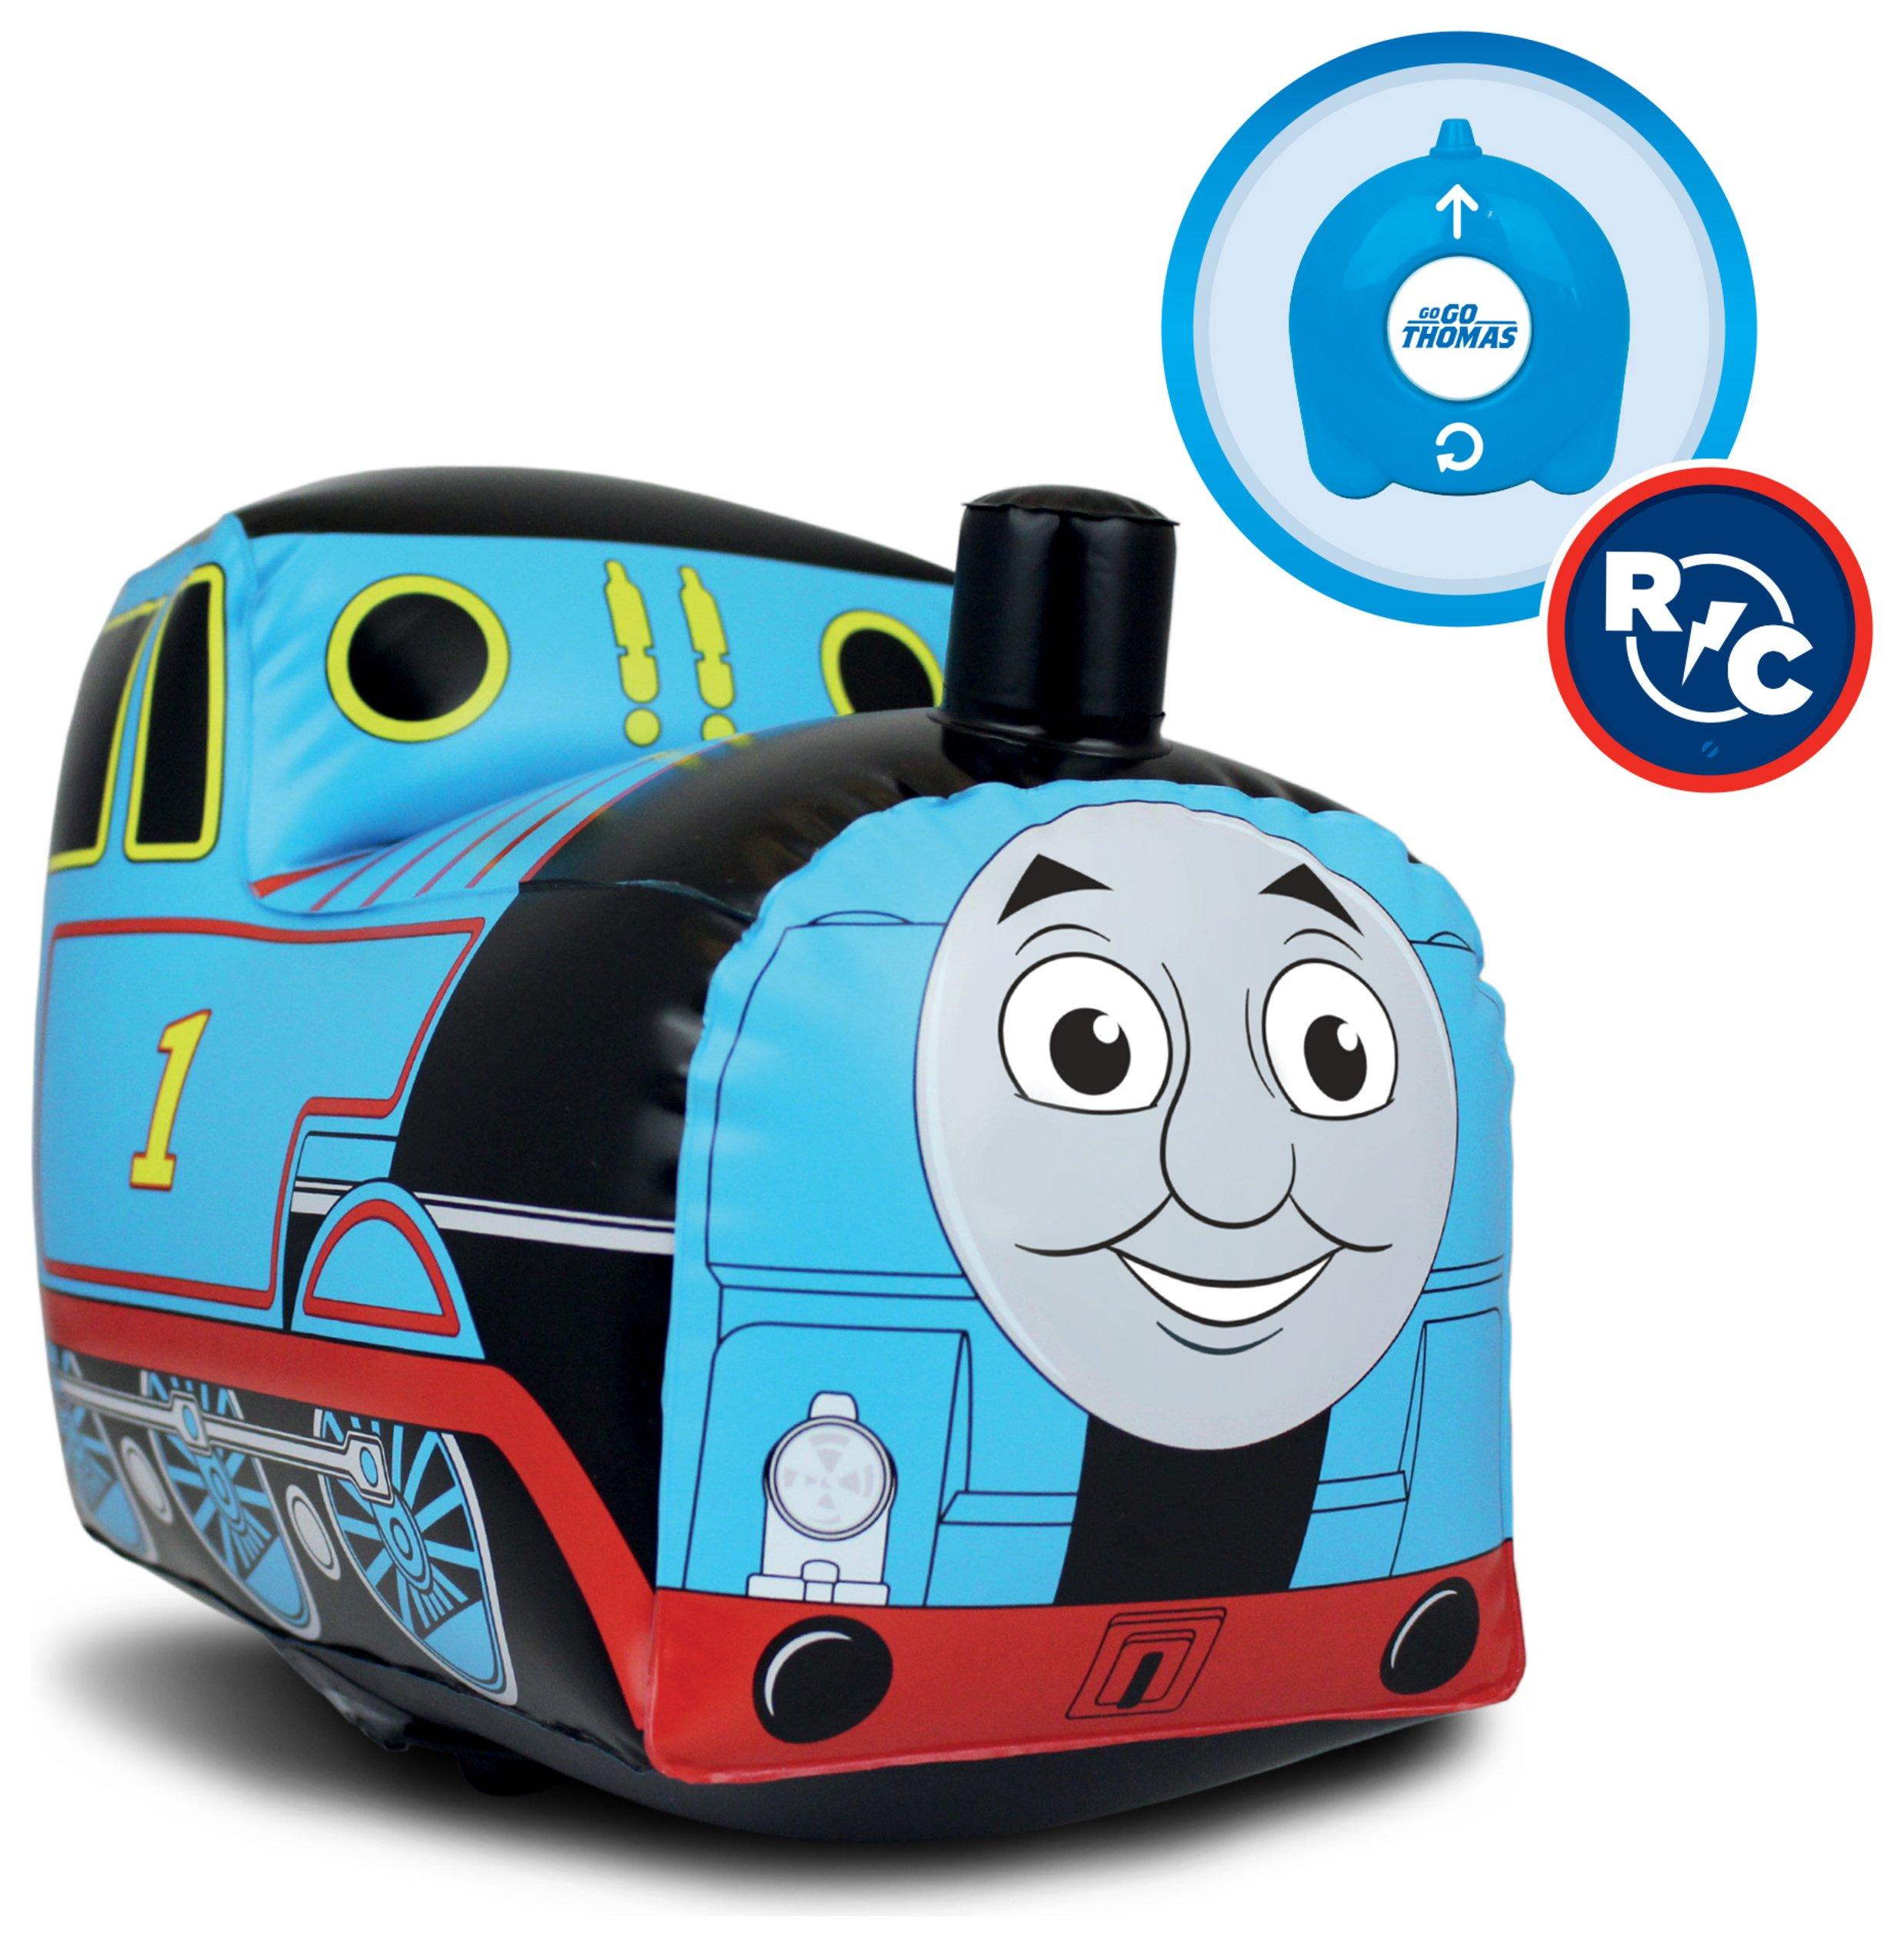 Thomas & Friends RC Inflatable Thomas - Jumbo